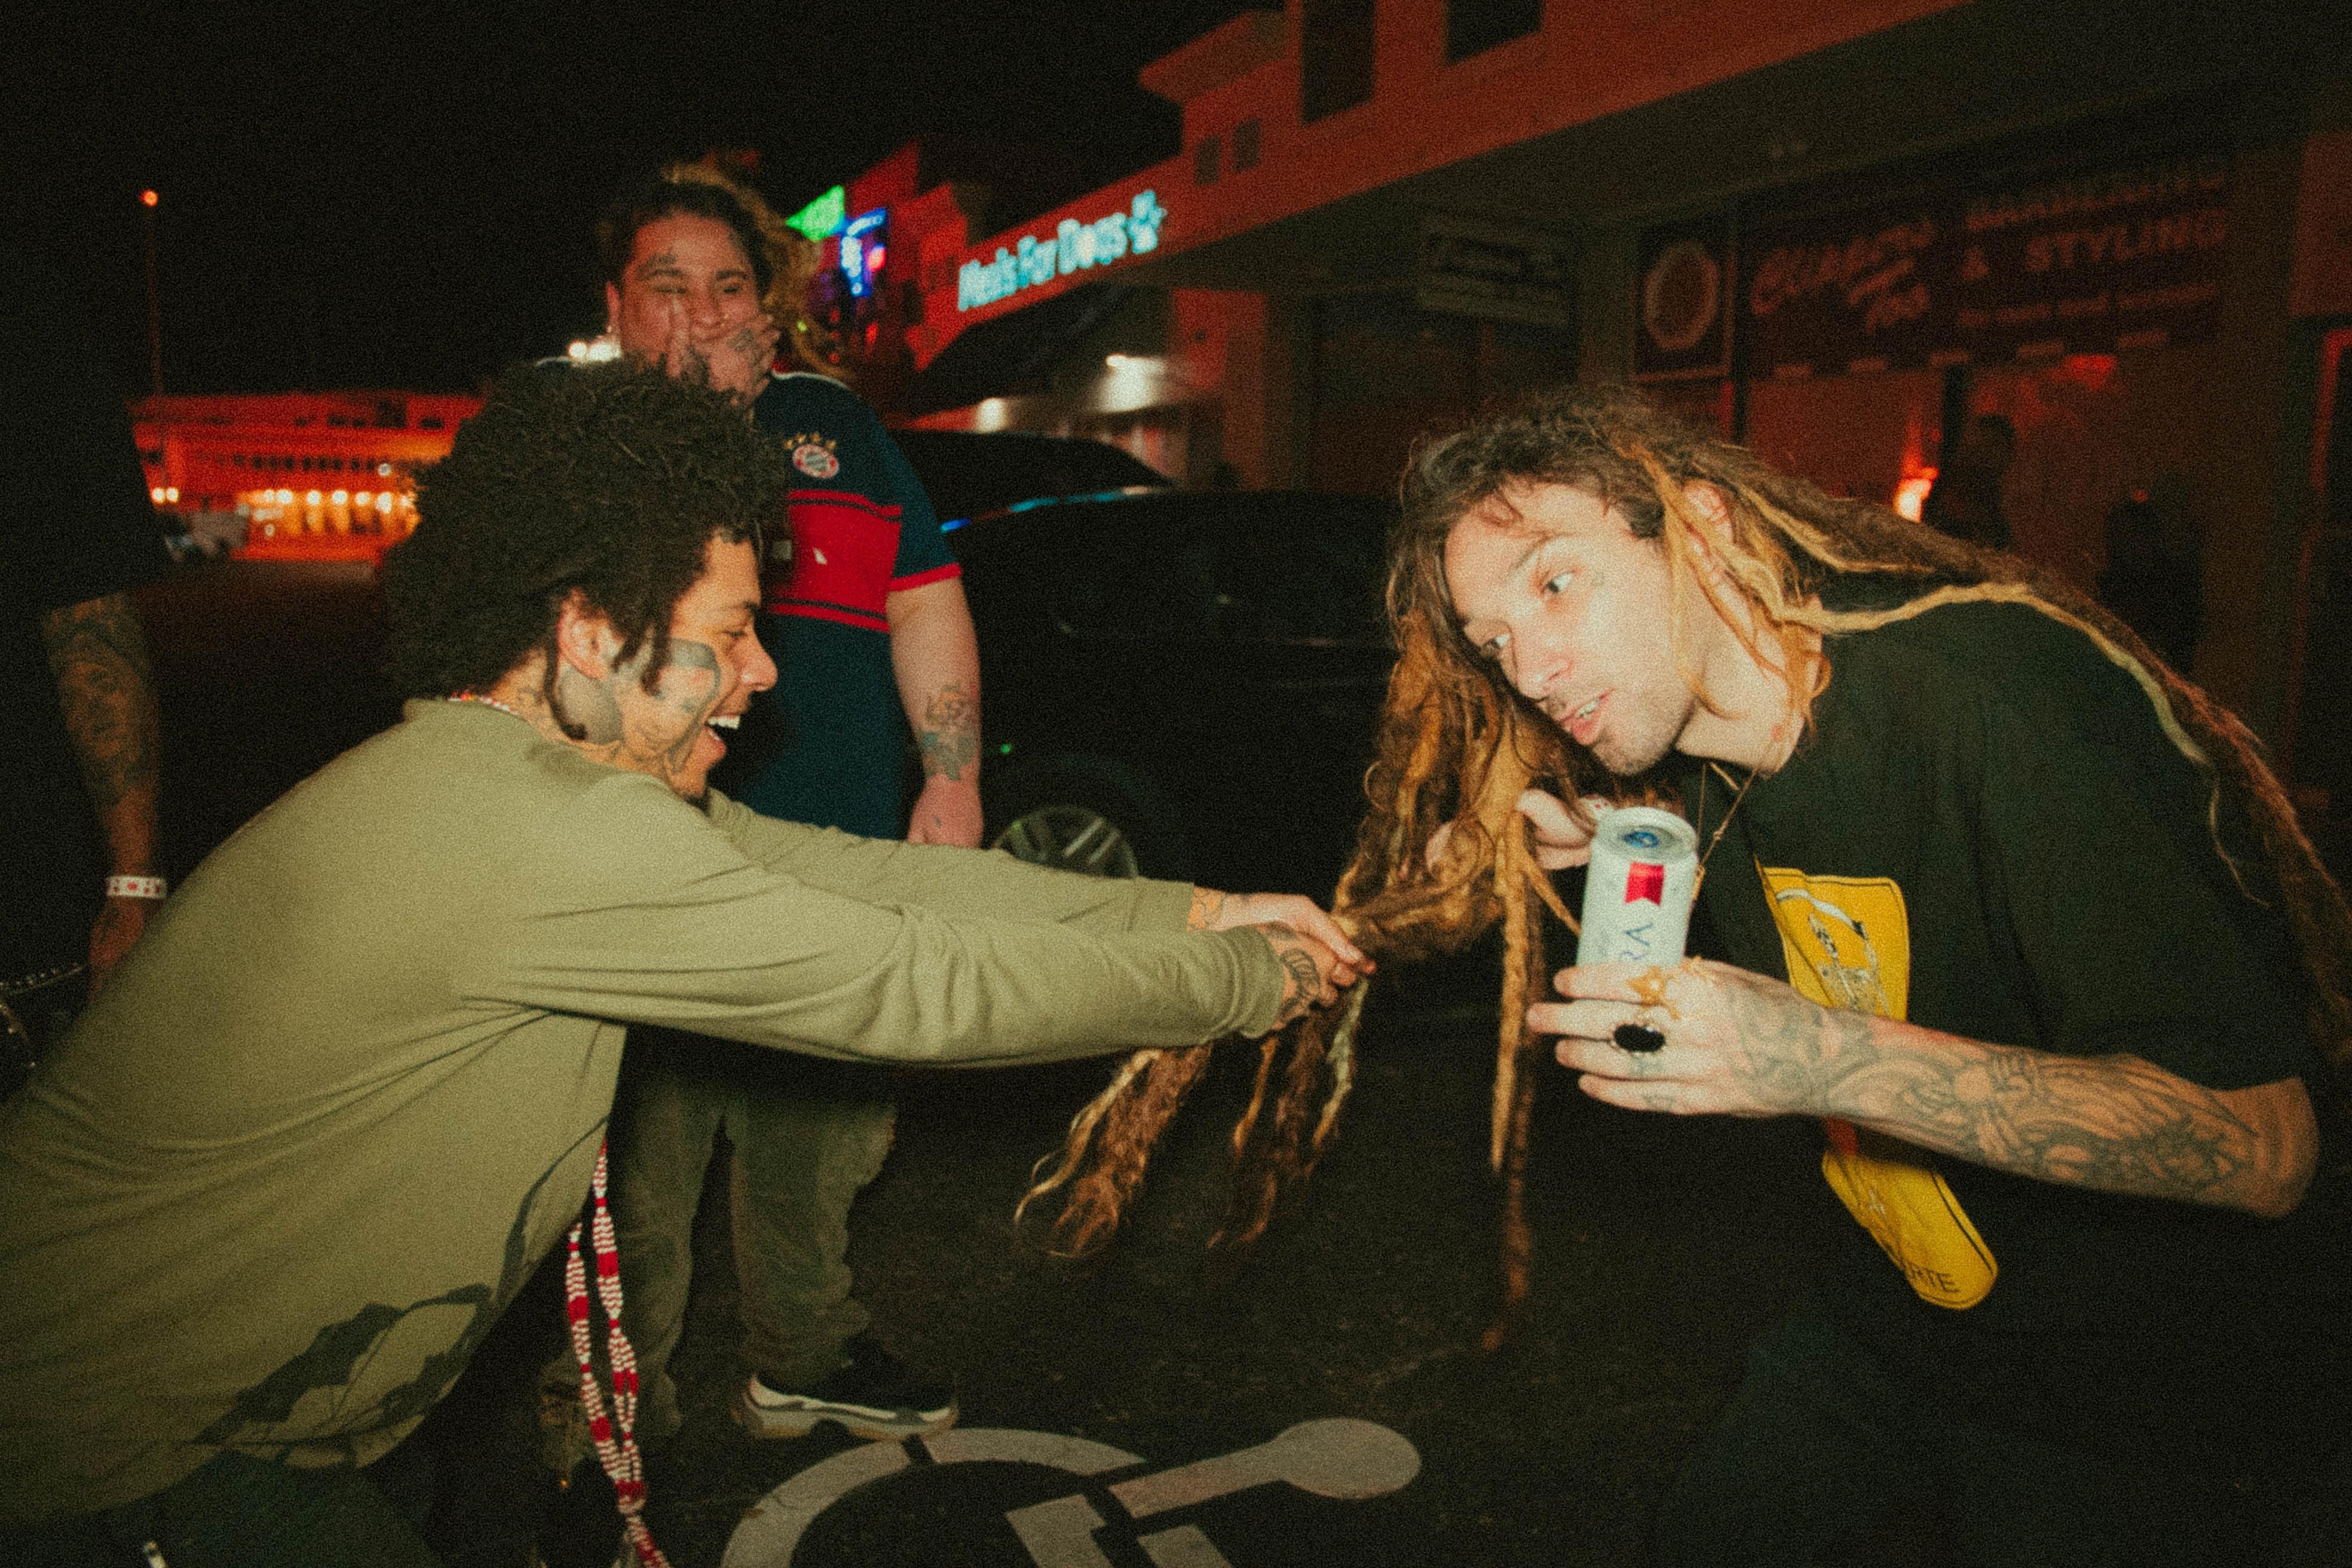 man holding hair dreadlocks hair of other man